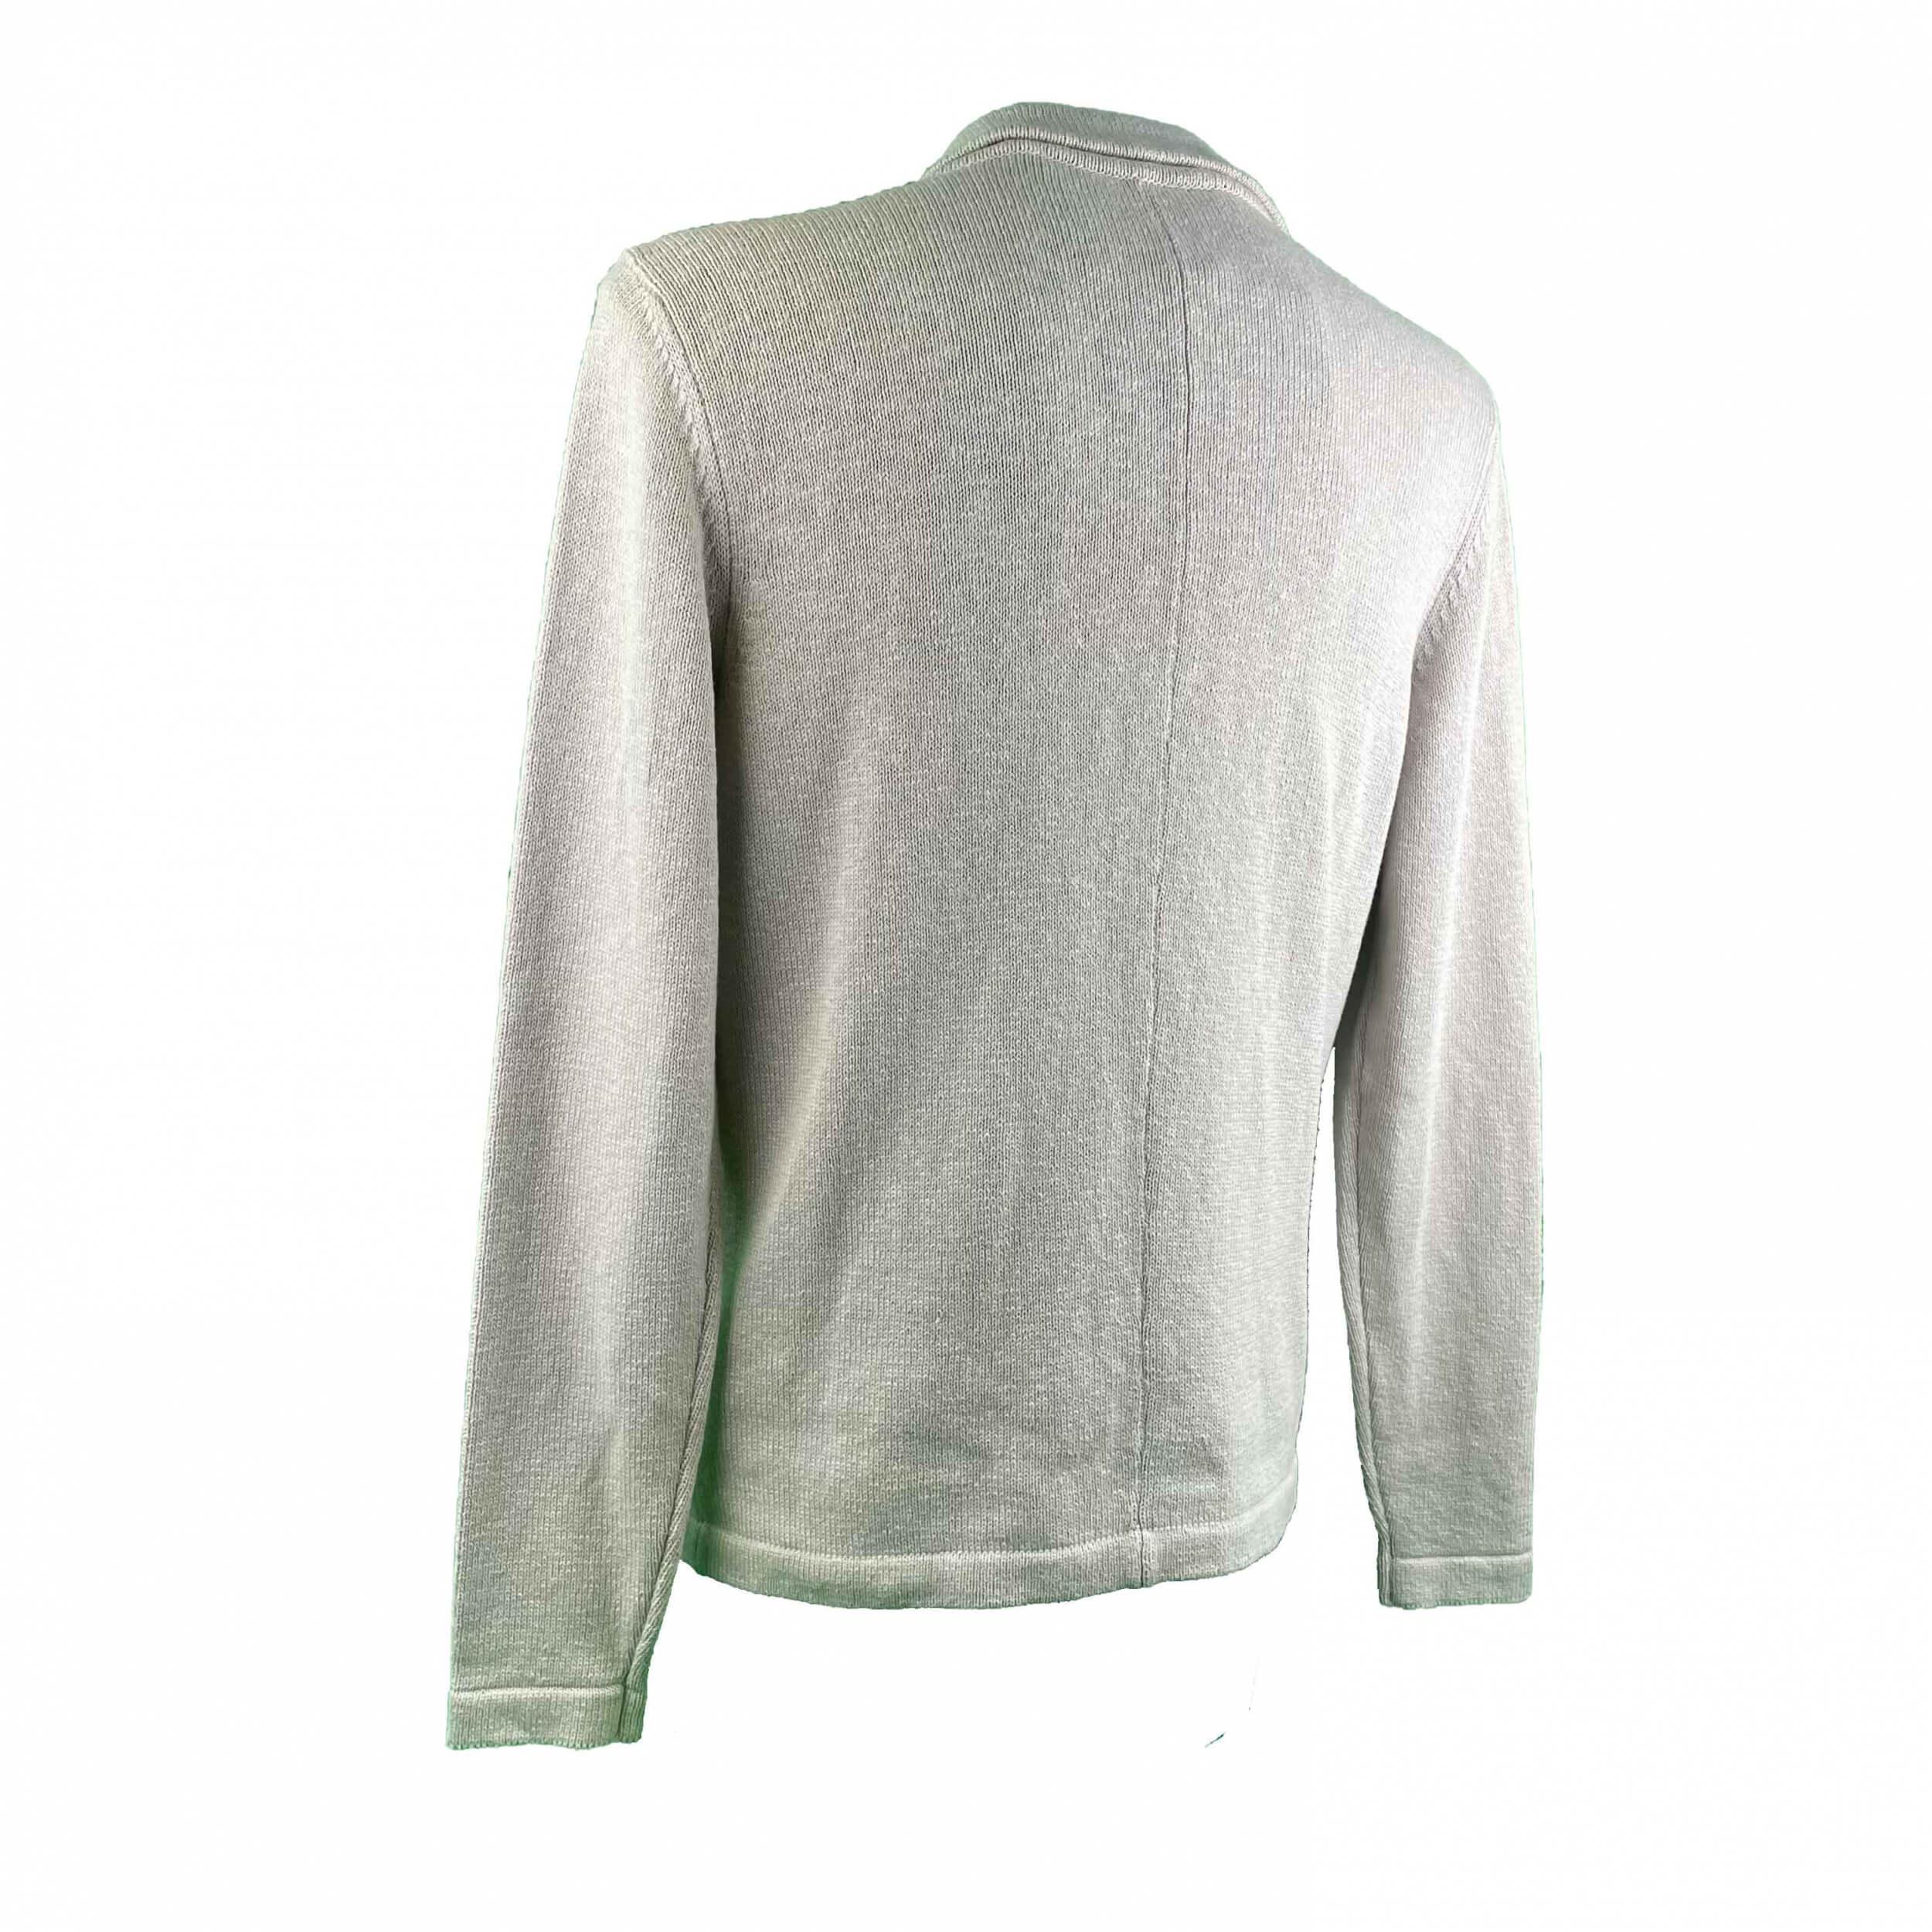 Chervo Herren Strick Sweater Nuccio beige 411